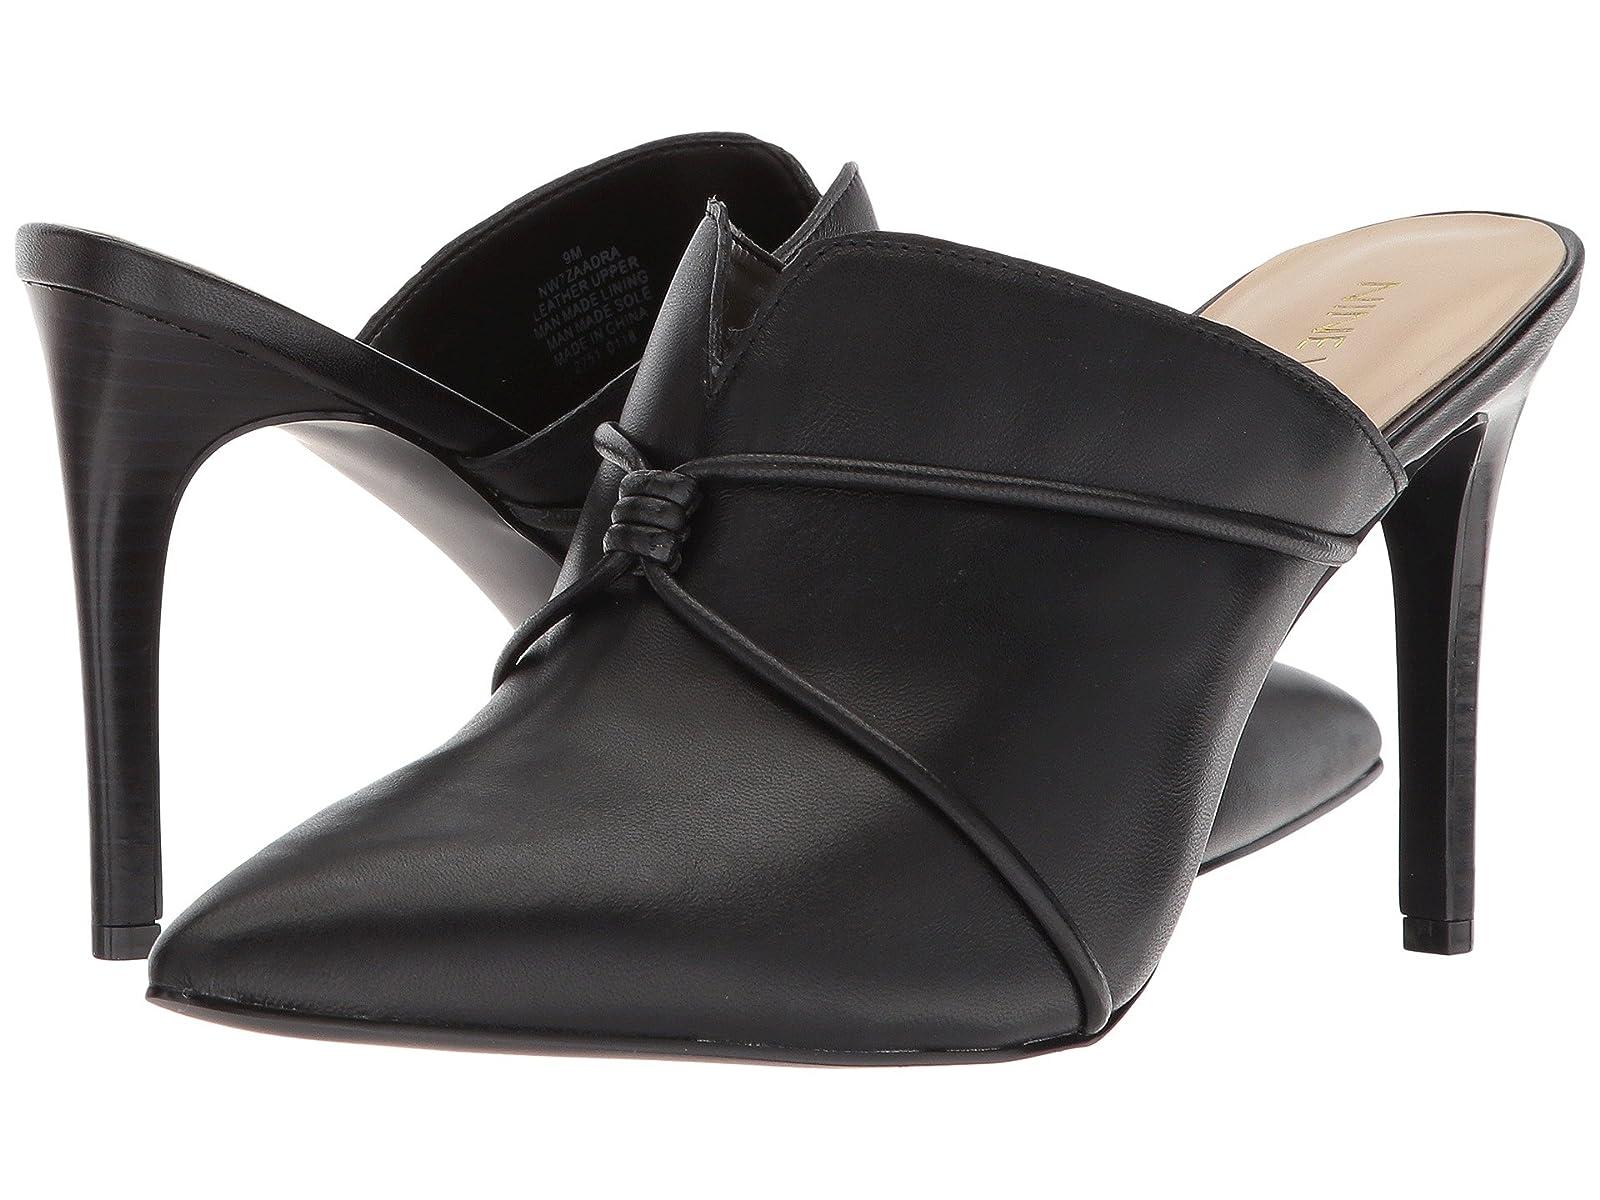 Nine West ZaadraCheap and distinctive eye-catching shoes